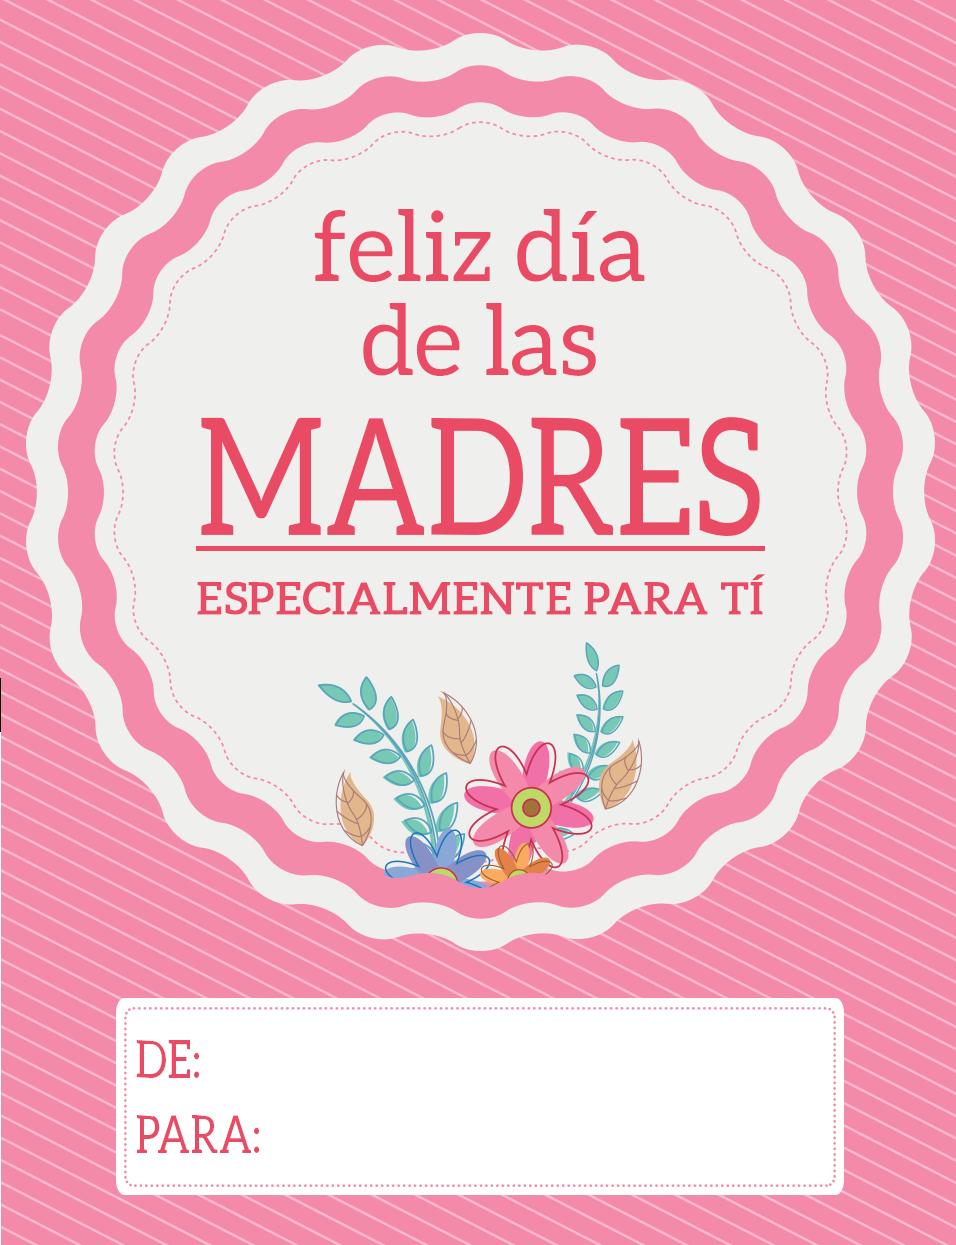 Mother Day Cards Mother S Day Psd Card Mama Mother S Day Card Spanish Text Card Motherboard Day Card Feliz Dia De La Madre Imprimibles Del Dia De